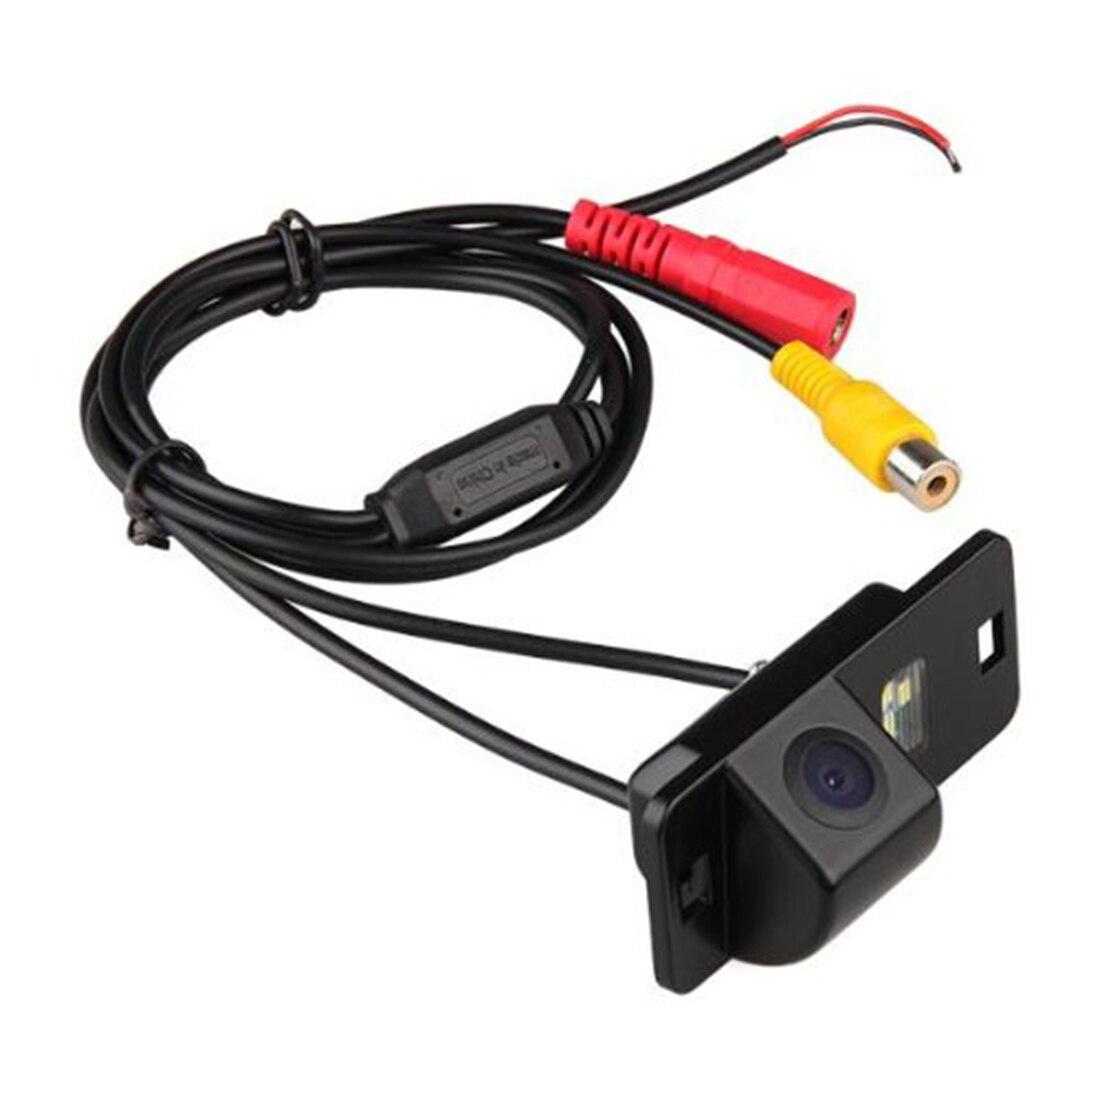 Marsnaska CMOS Car Rear View Reverse Backup Parking Camera Night Vision Waterproof For BMW X5 X6 Black